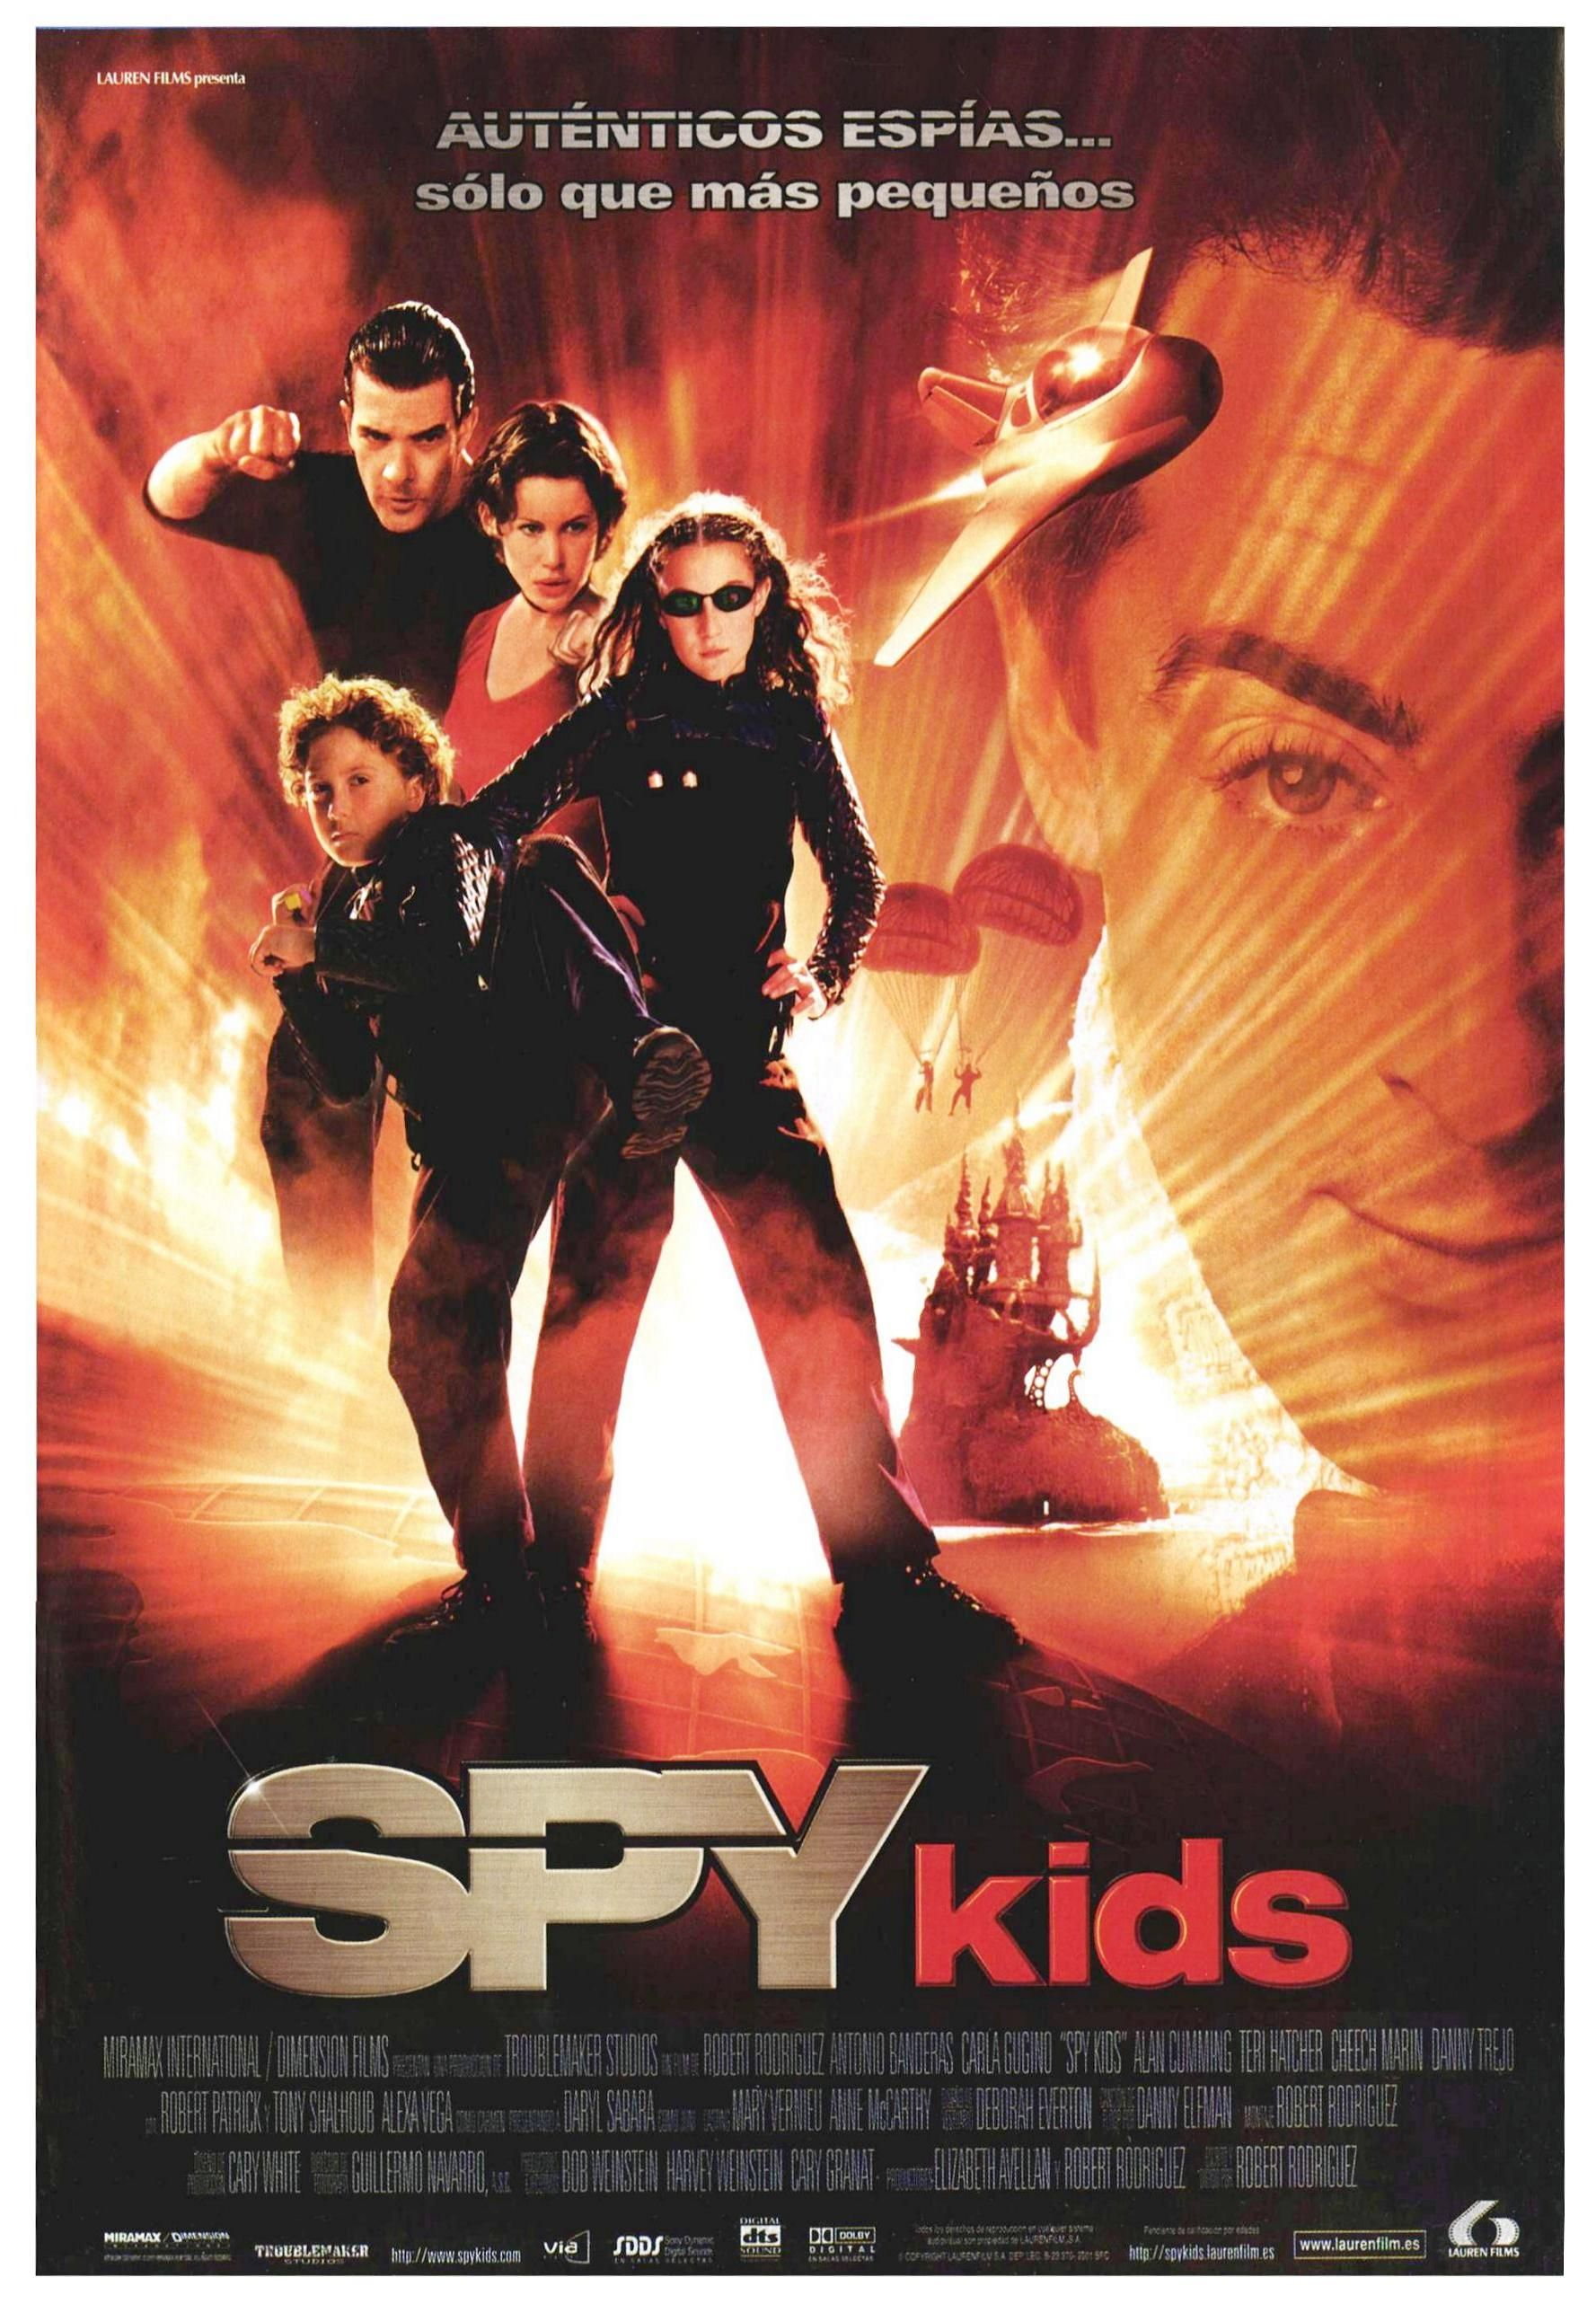 Spy Kids 2001 Tt0227538 Spy Kids Películas Completas Peliculas